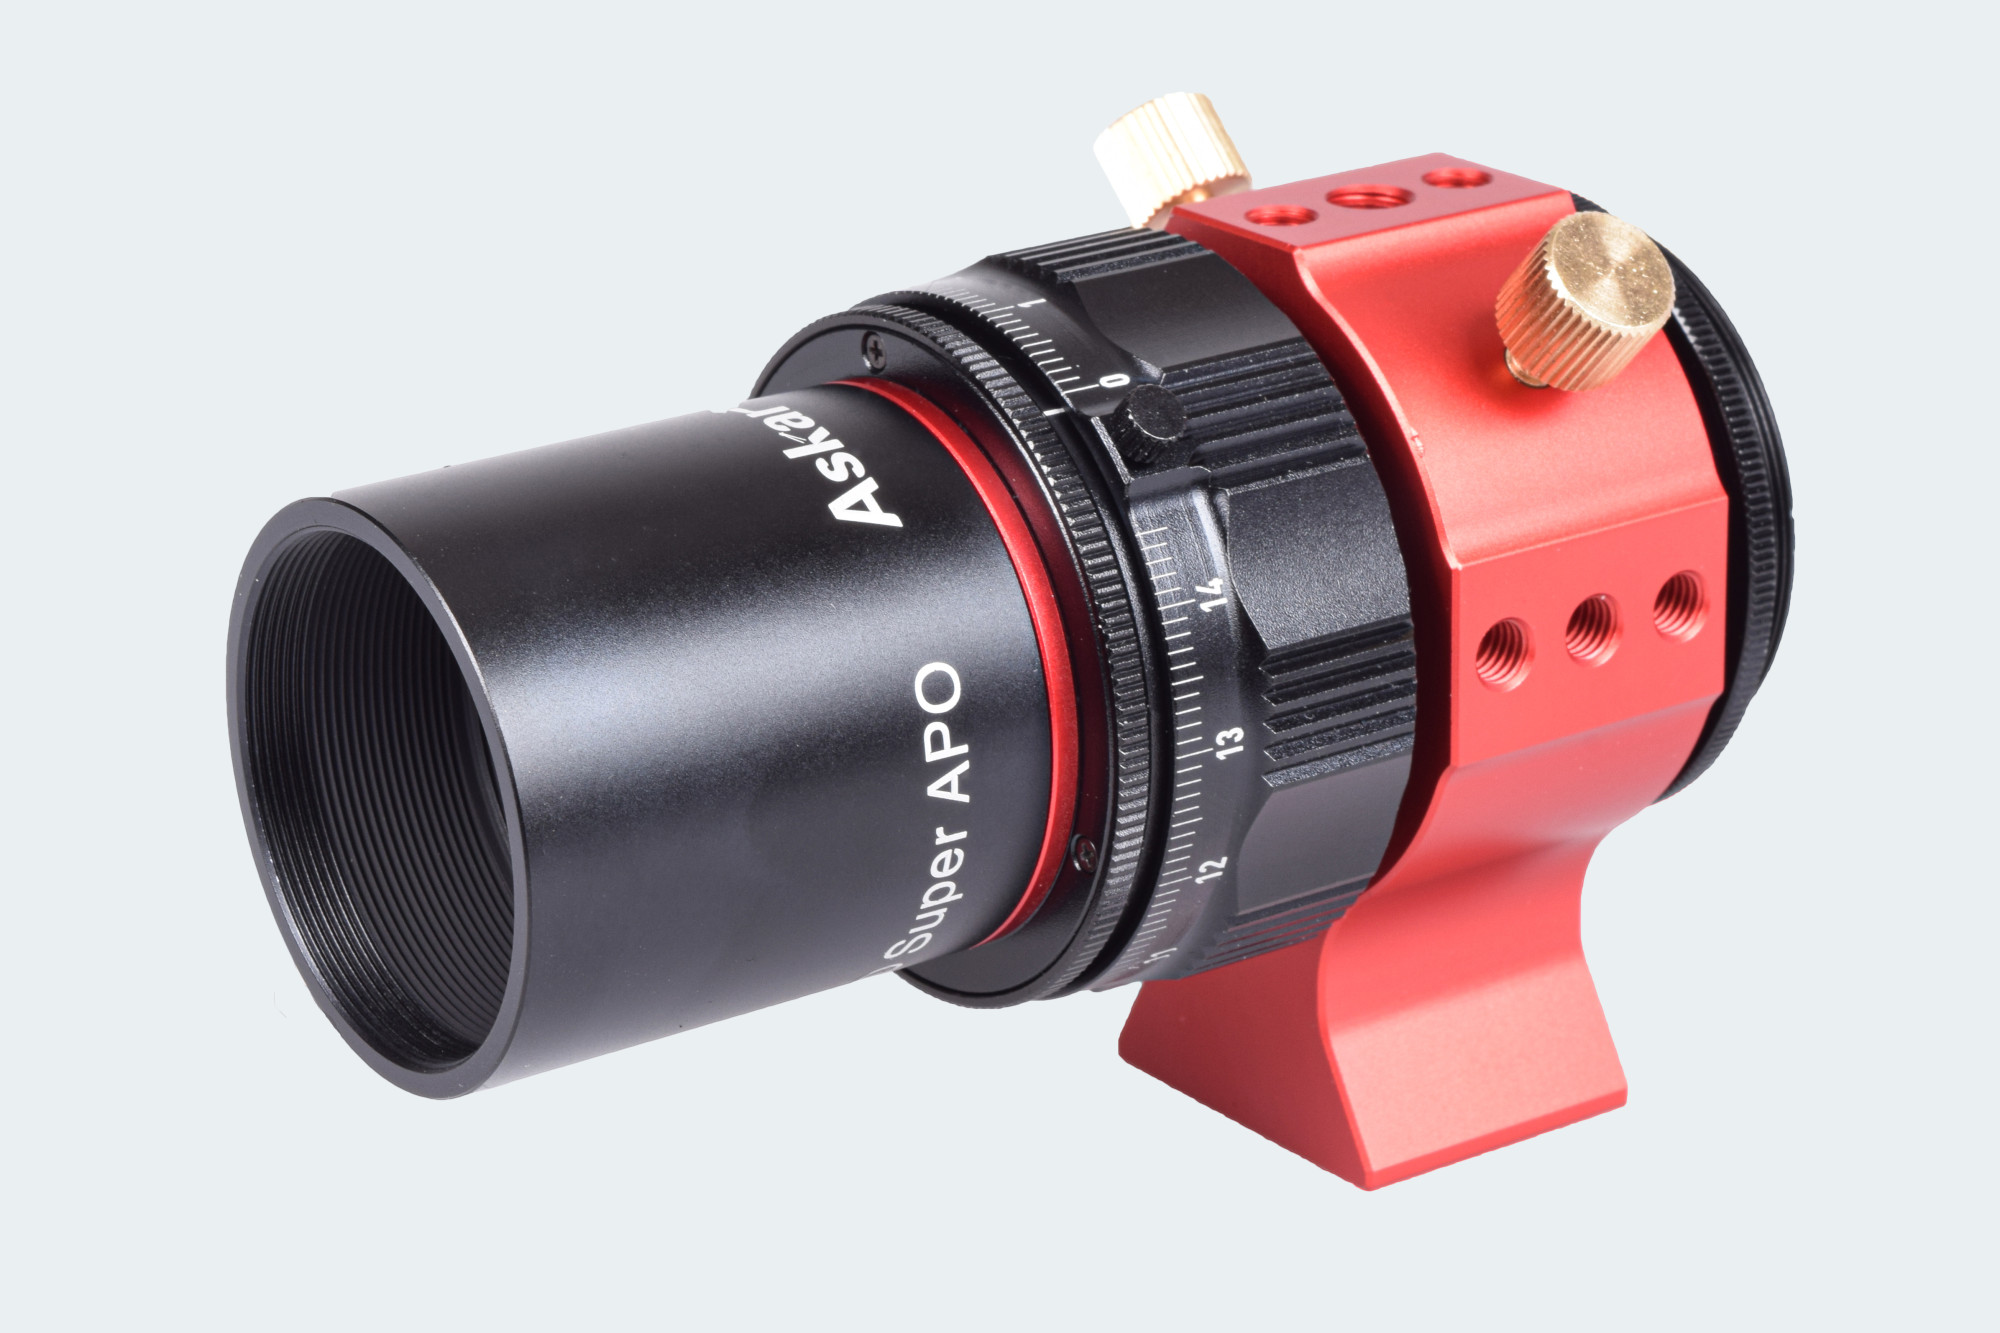 Askar 『FMA135』 口径30mmF4.5 EDアポクロマート鏡筒